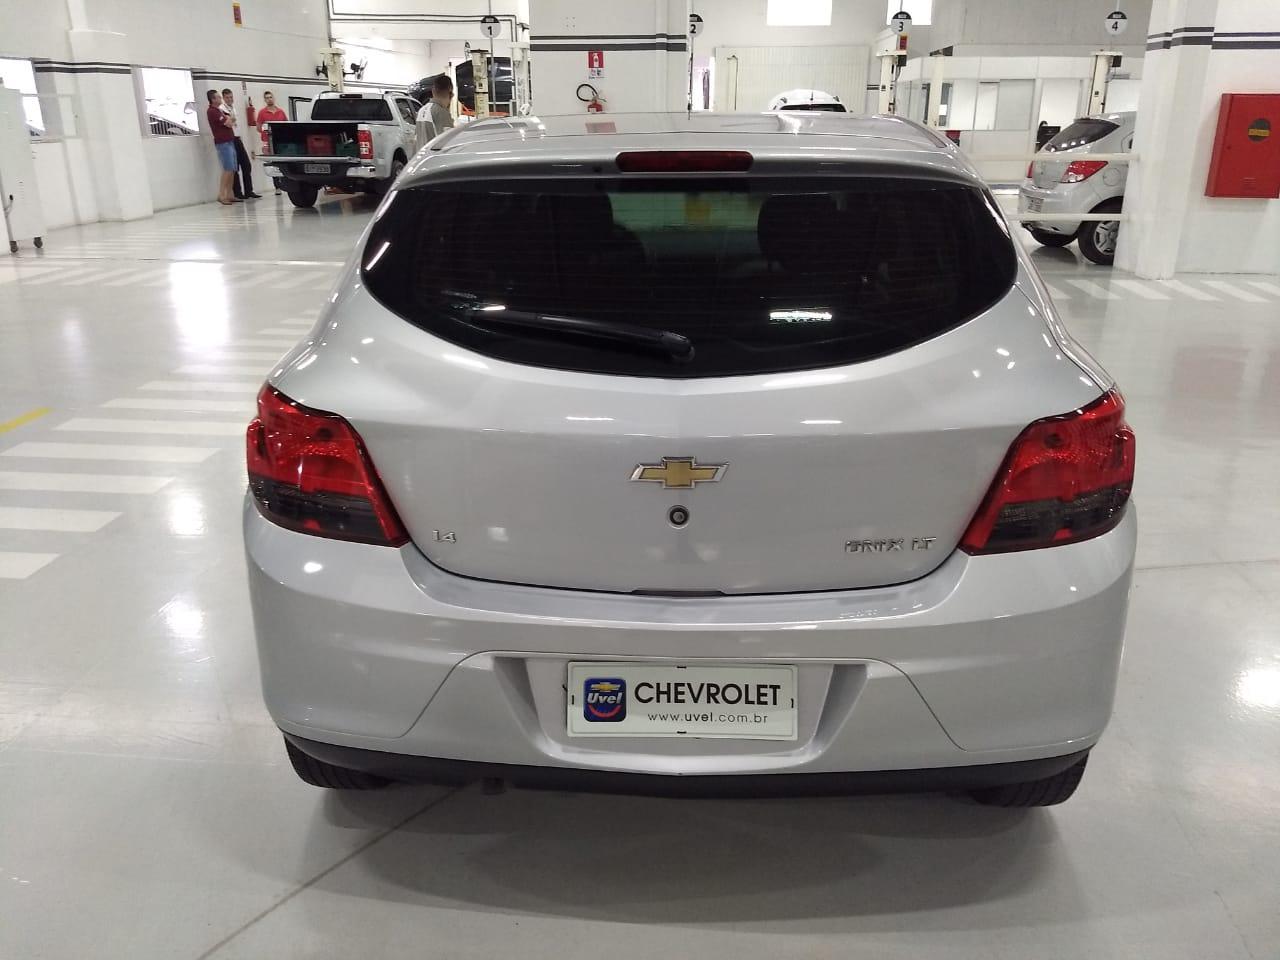 Chevrolet Onix LT 1.4L 2015